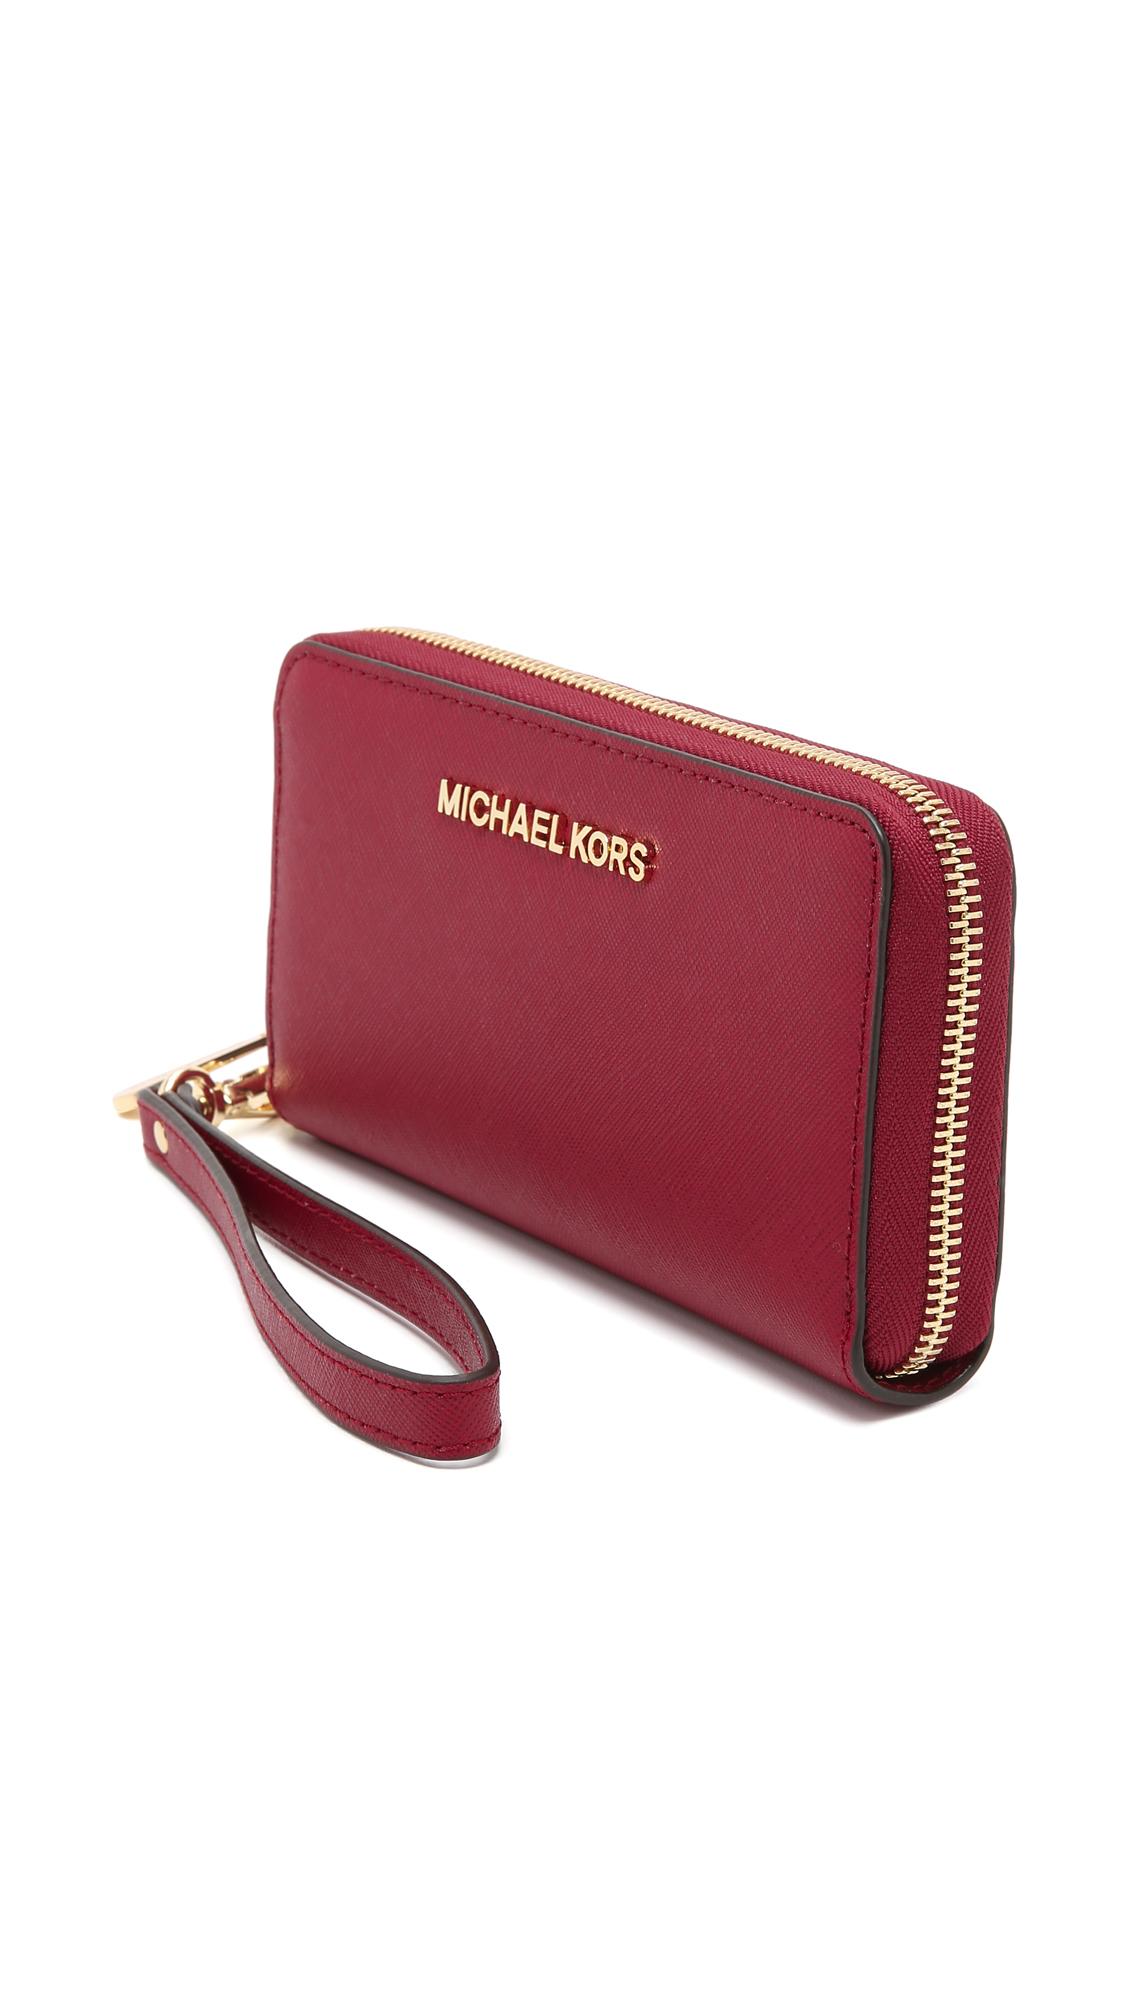 ... michael kors Jet Set Large Phone Case Wallet - Ballet in Red : Lyst